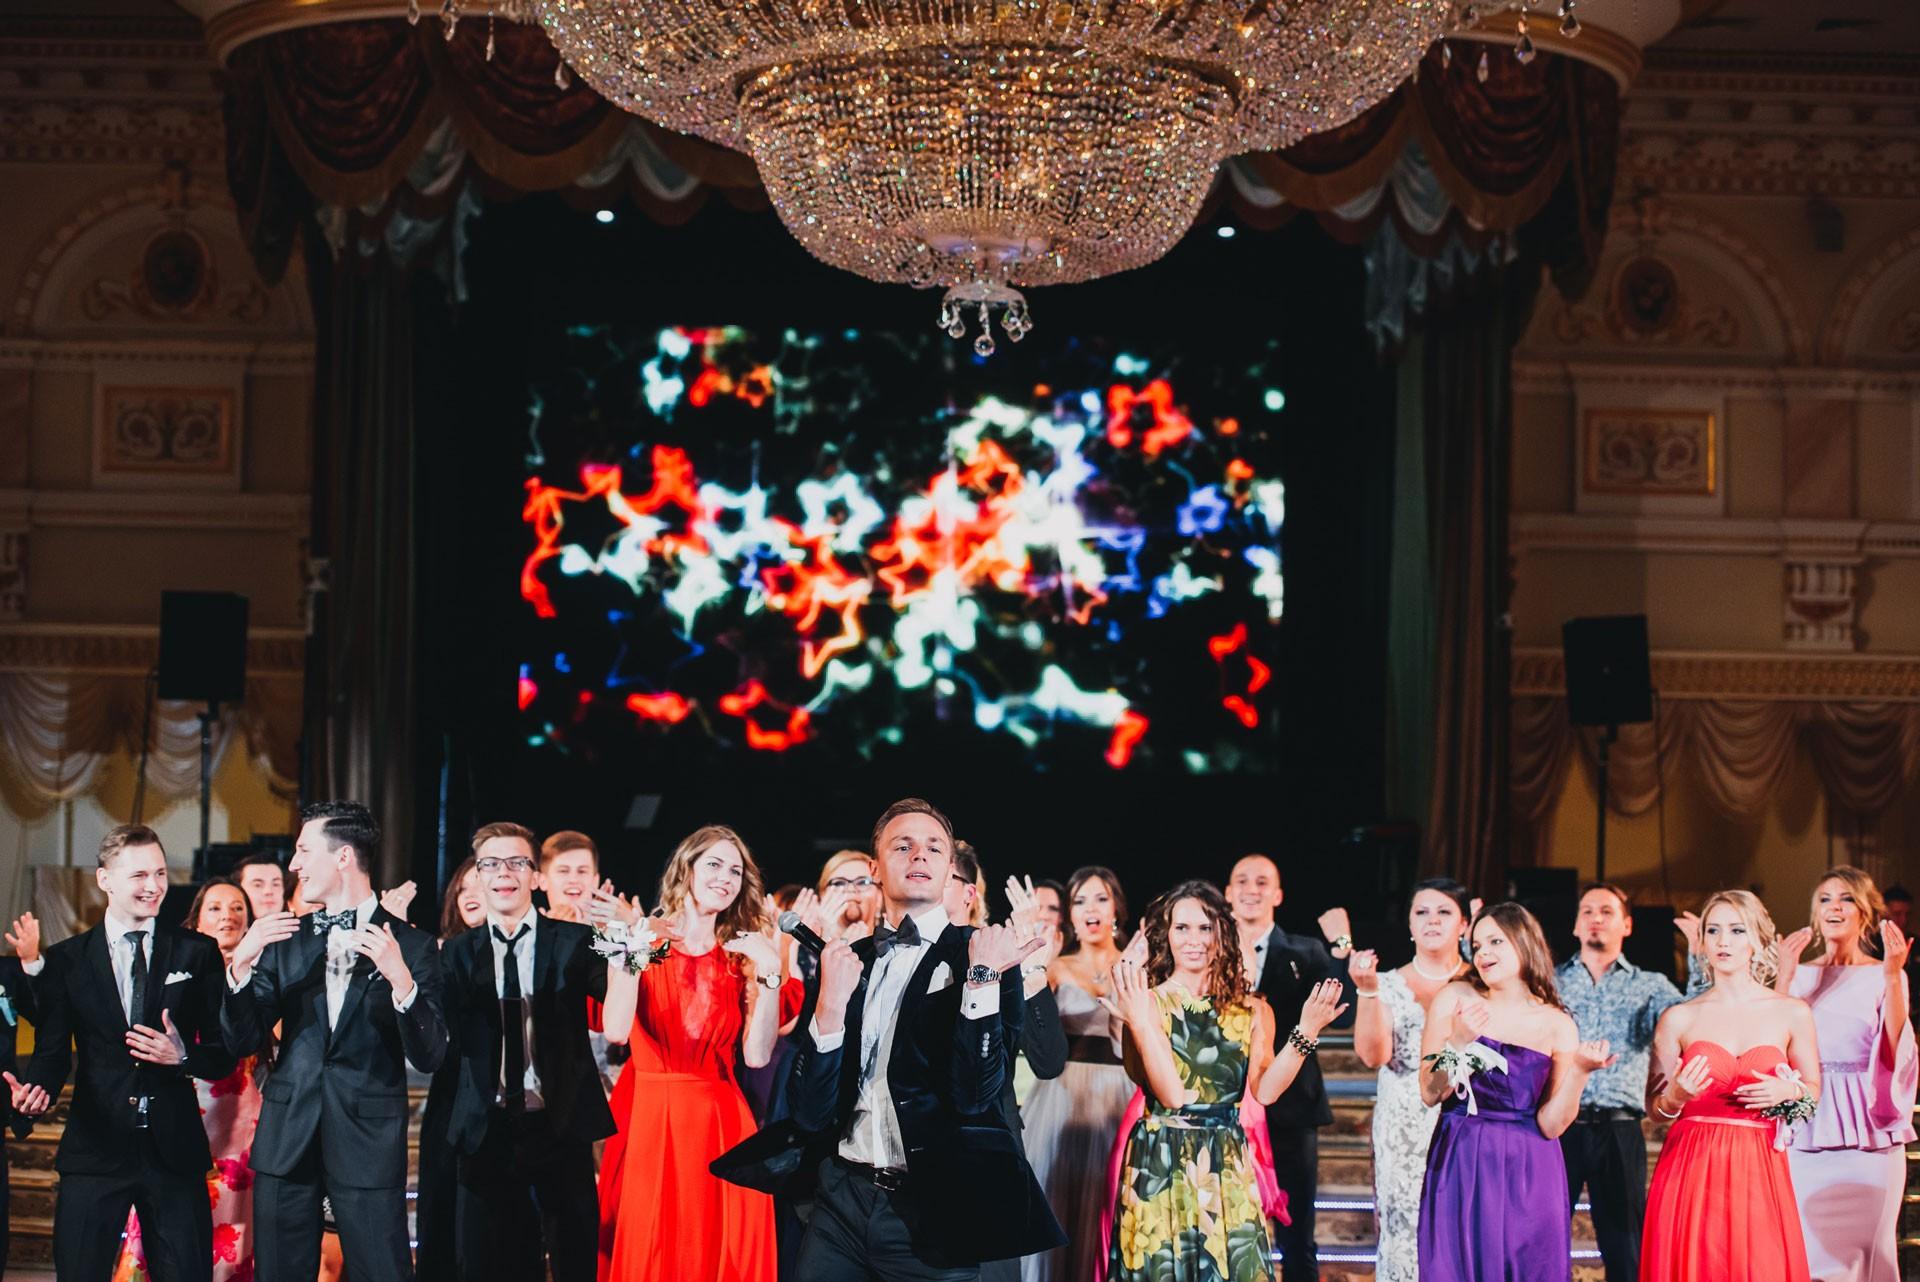 Свадьба Ксении Сябитовой и Андрея Снеткова фото 16